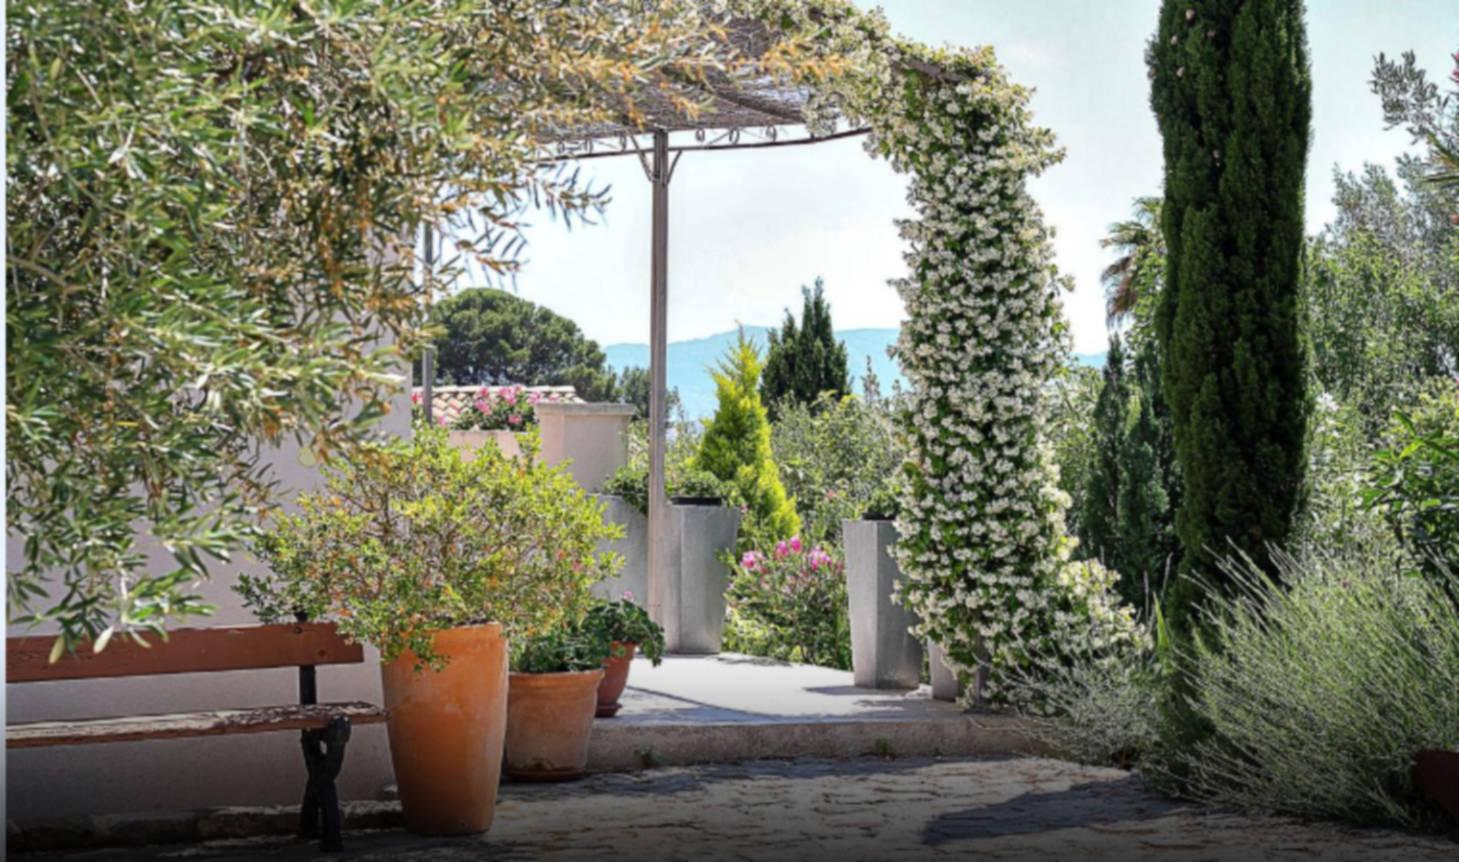 A group of bushes and trees at Le CLos du Jas.